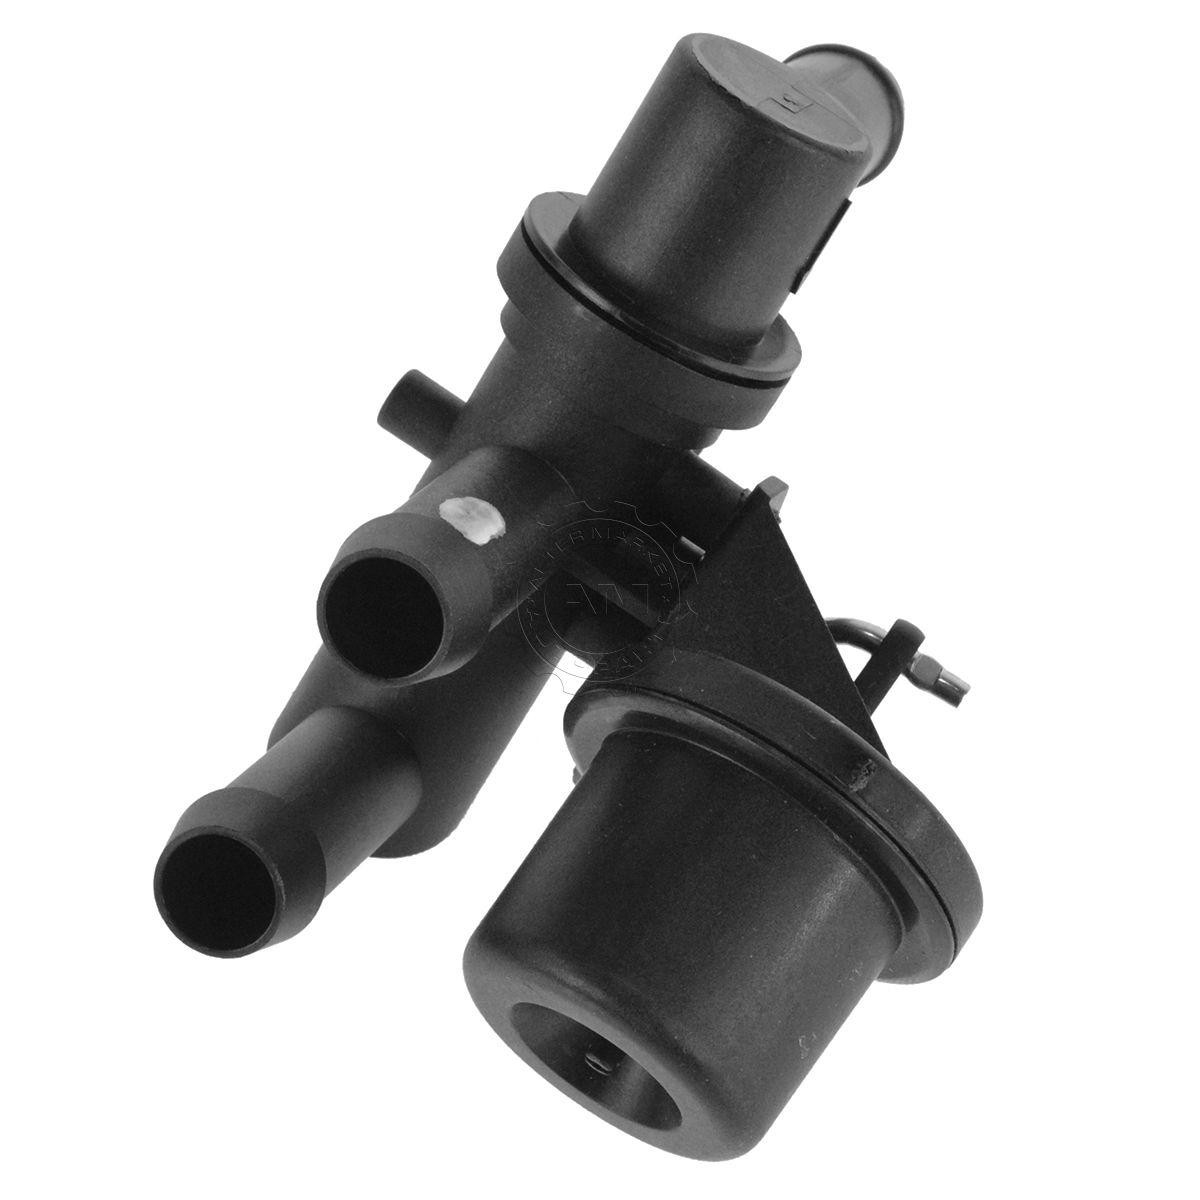 Motorcraft Heater Control Bypass Valve For Ford Explorer Ranger Mercury Ebay